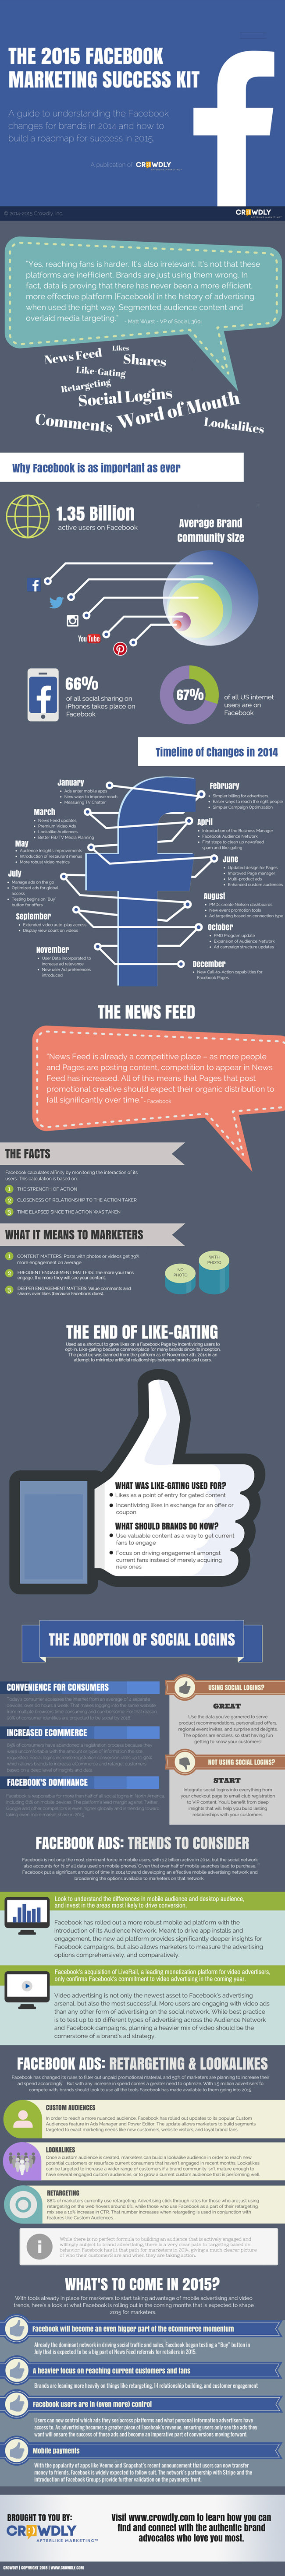 The 2015 Facebook Marketing Success Kit - #infographic #socialmedia Facebook advertising trends.